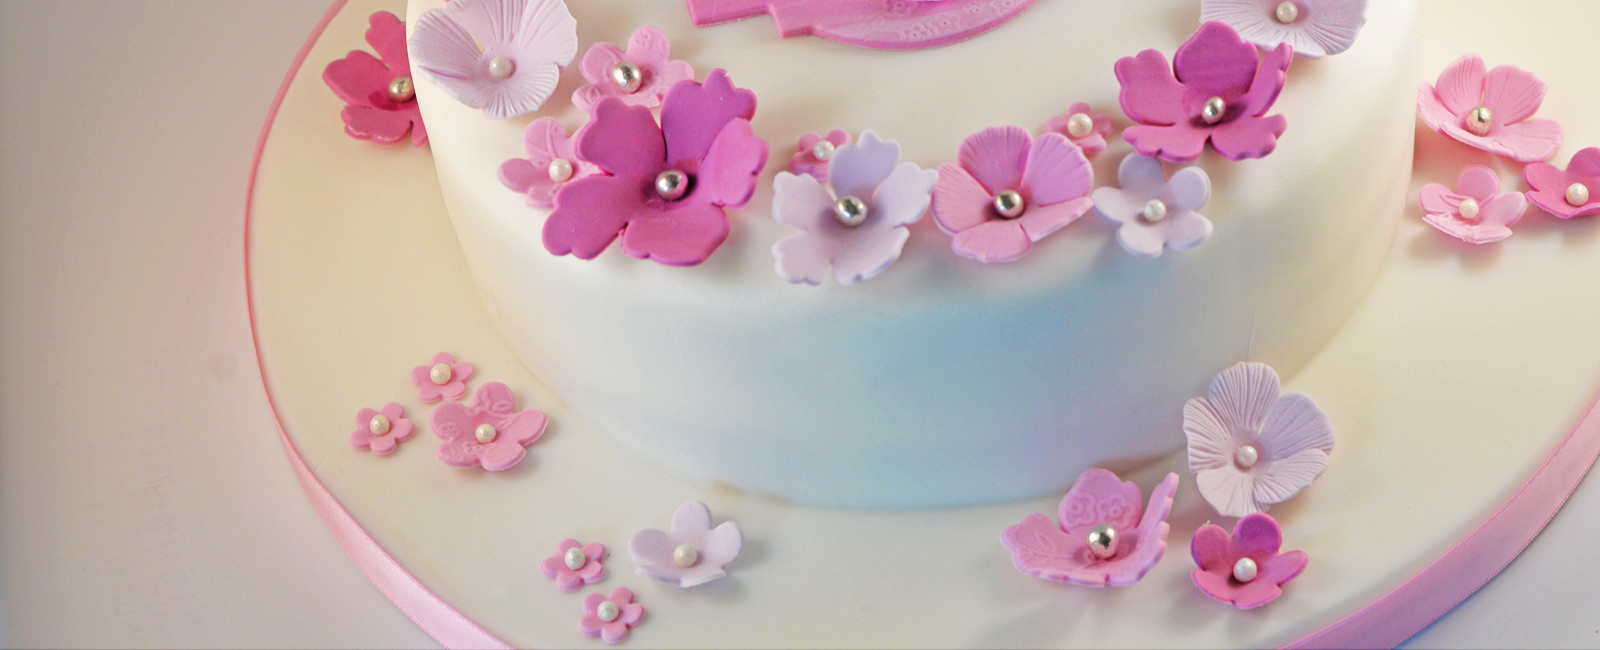 Judith Bond Cakes Cakes Llandudno Wedding Cakes Birthday Cakes